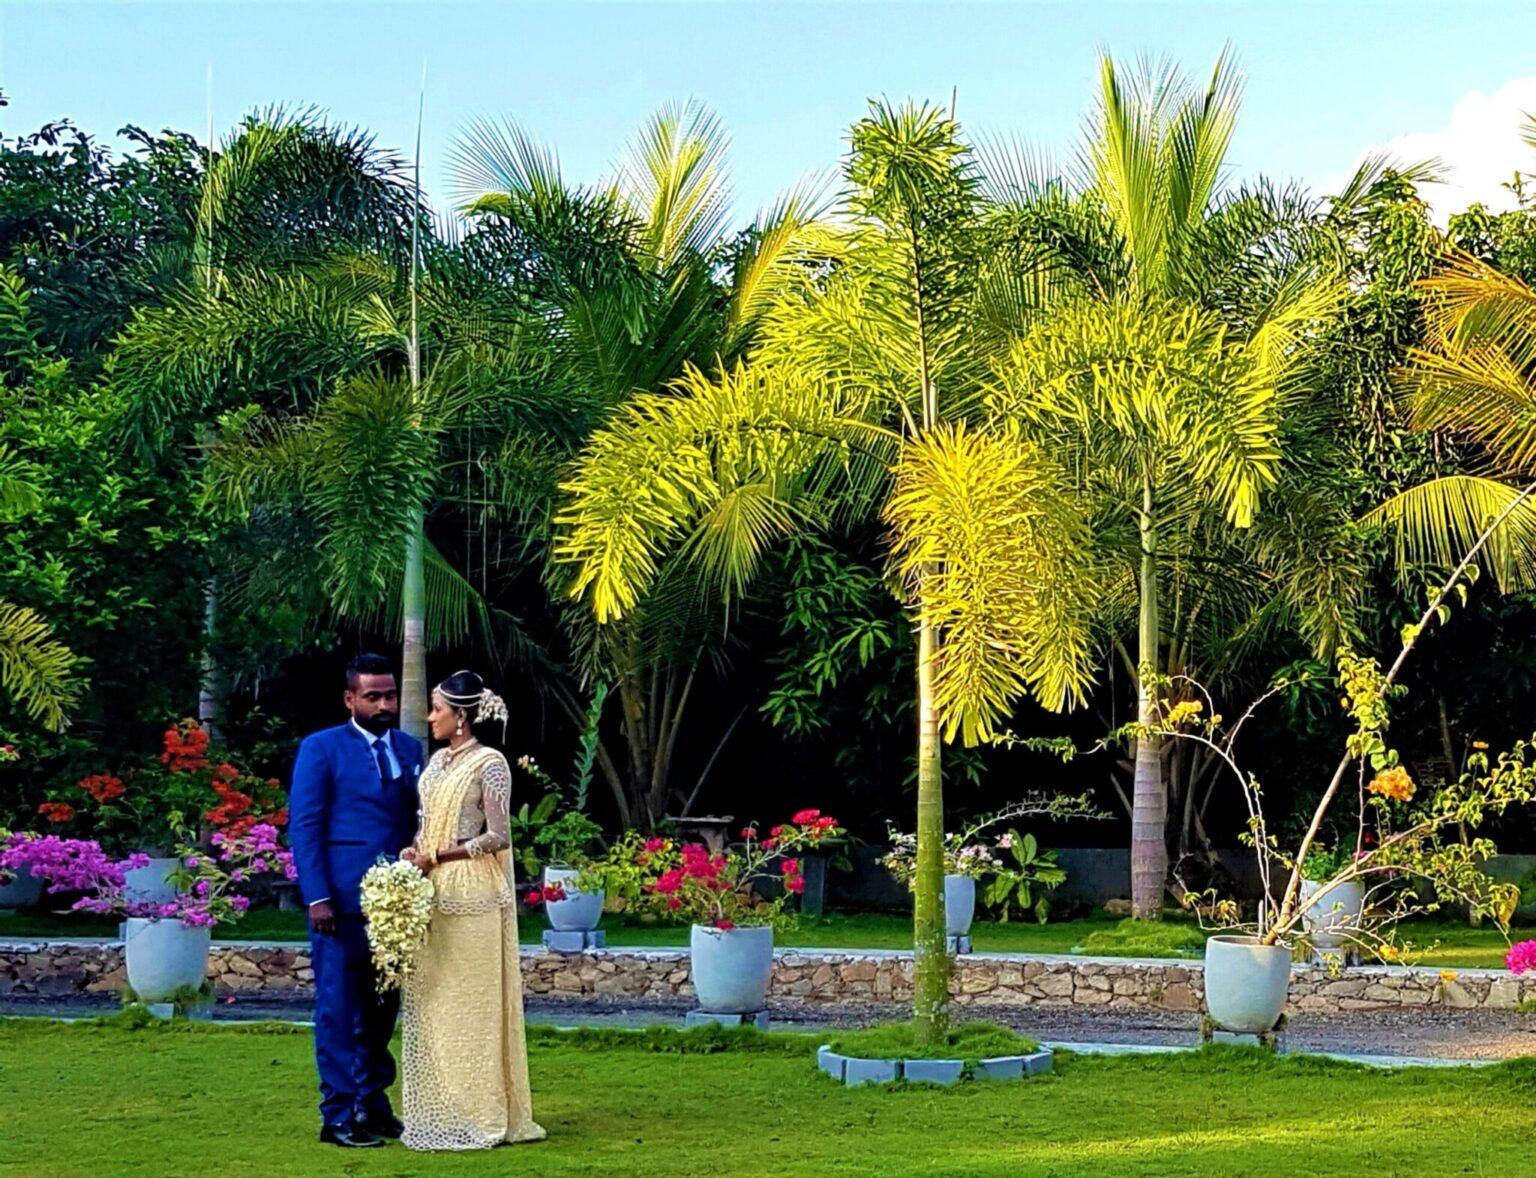 Wedding_20190308 (2)